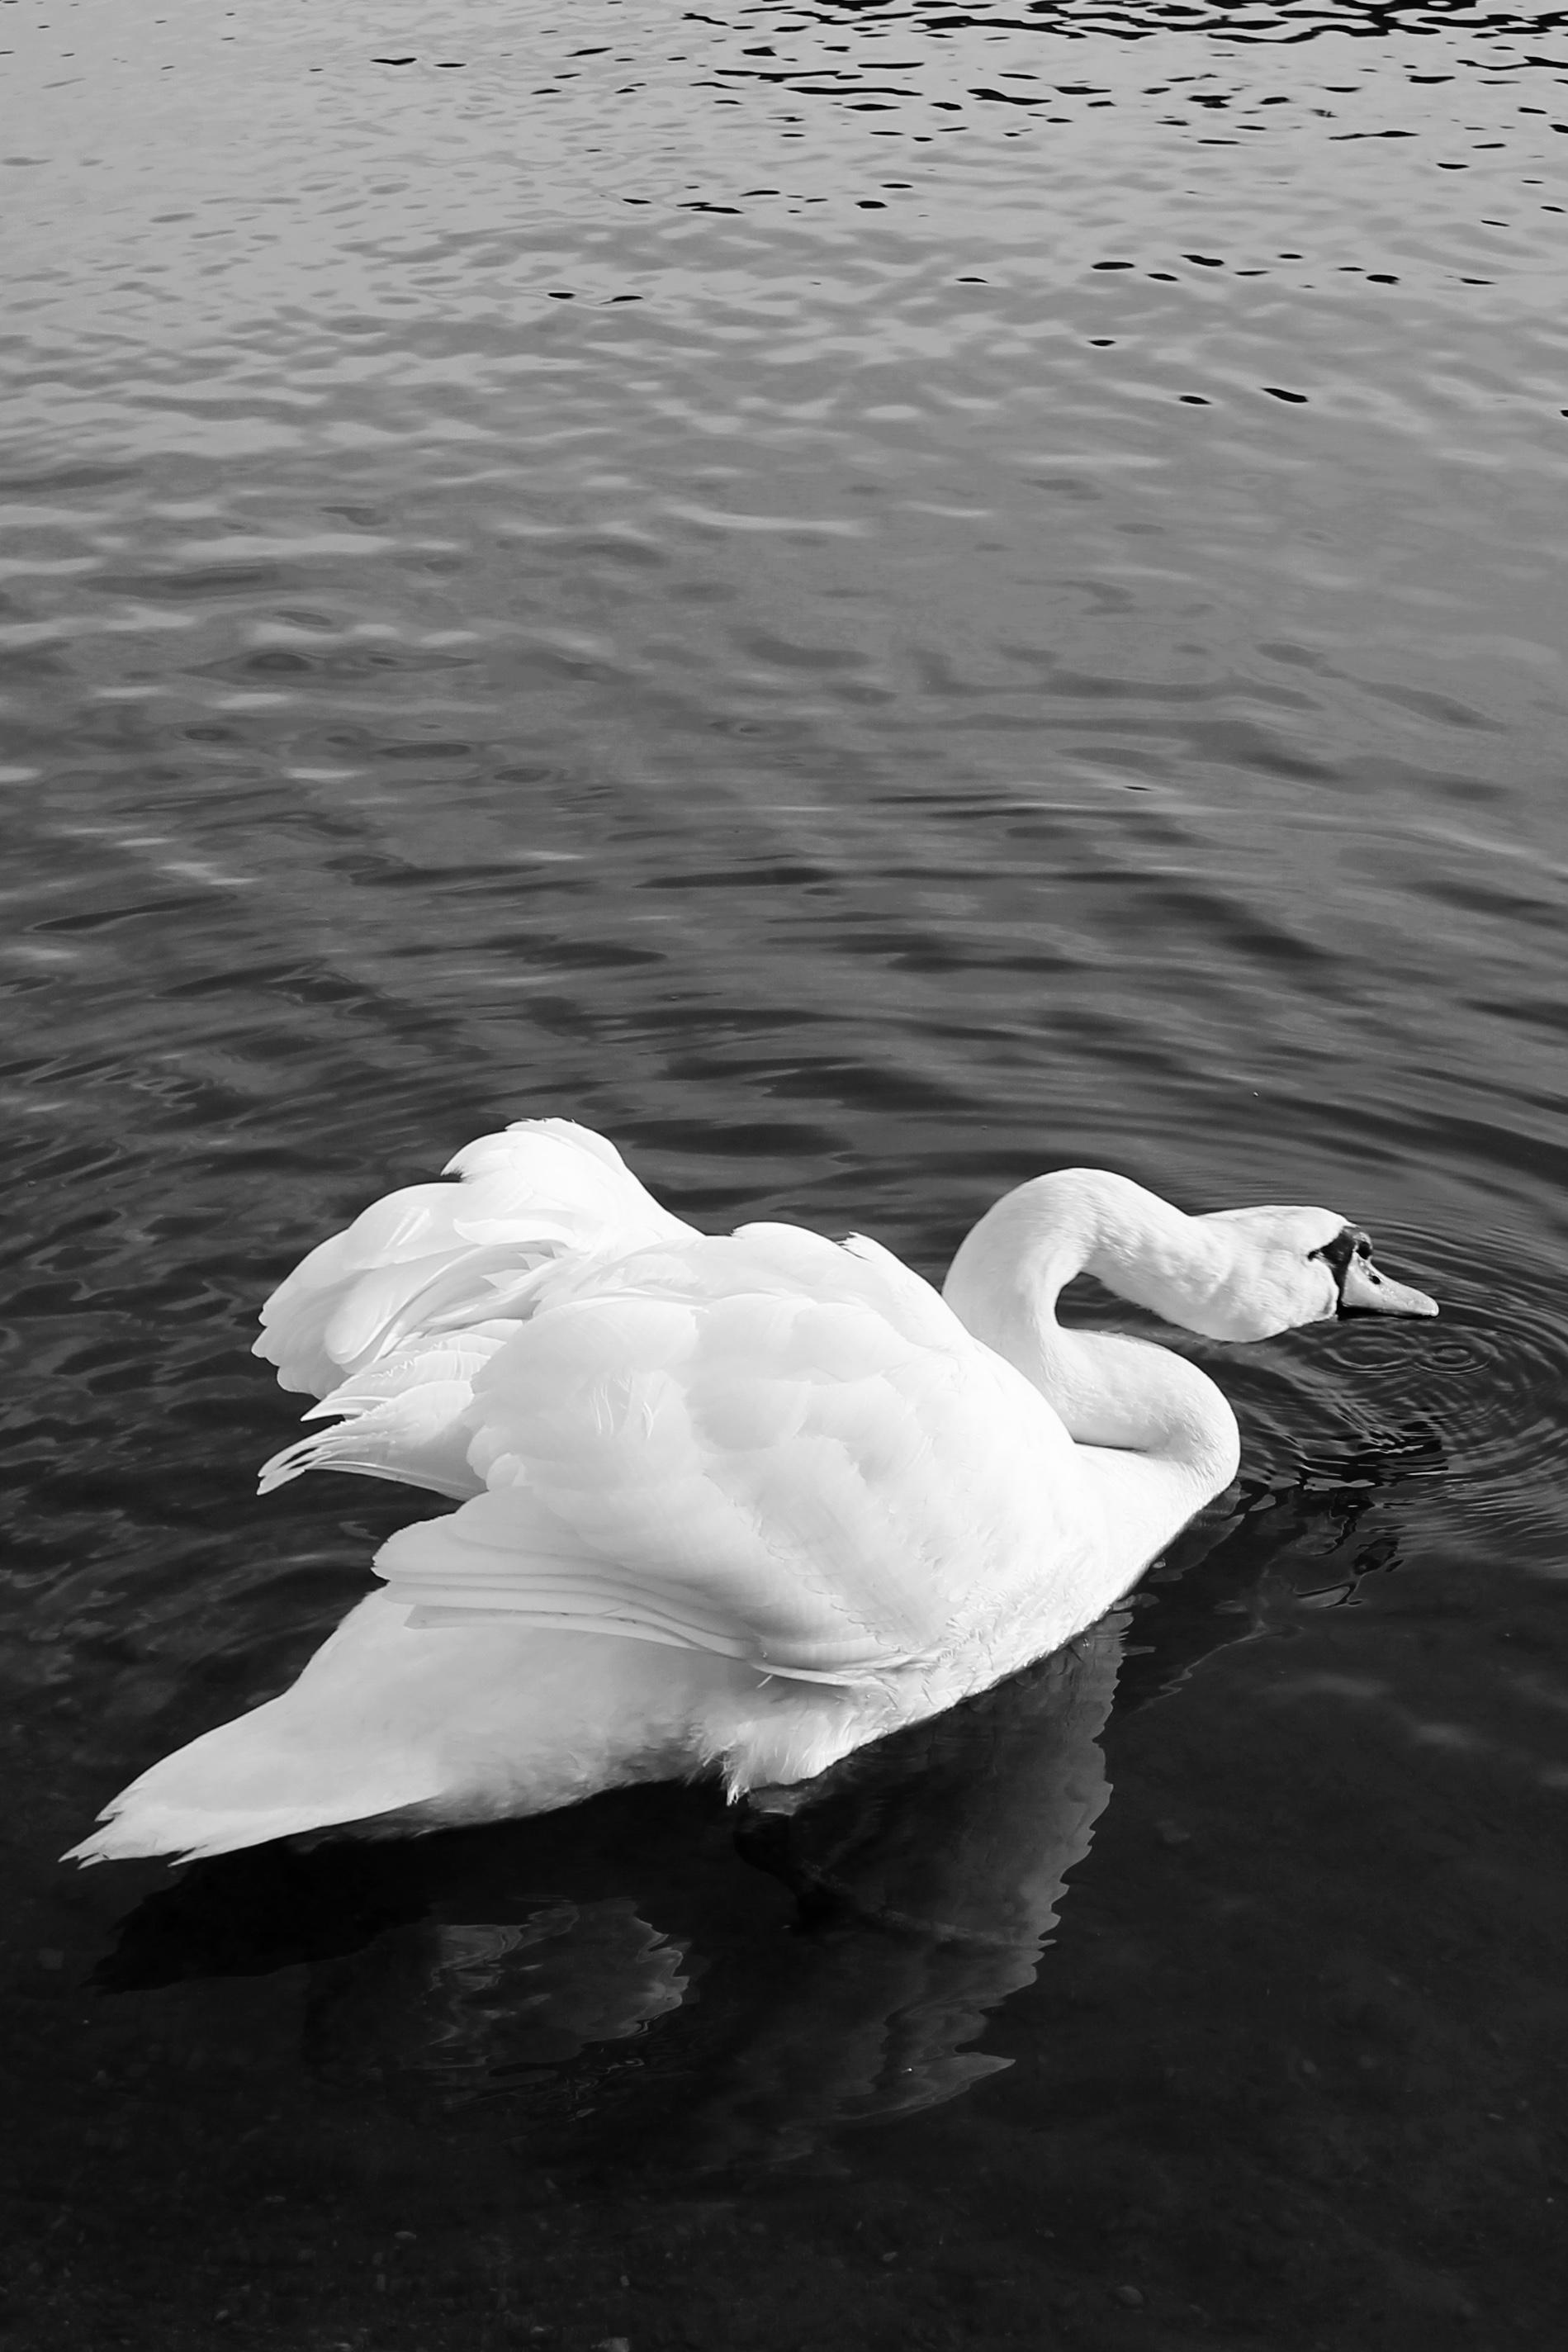 Swan, Austria, 2016